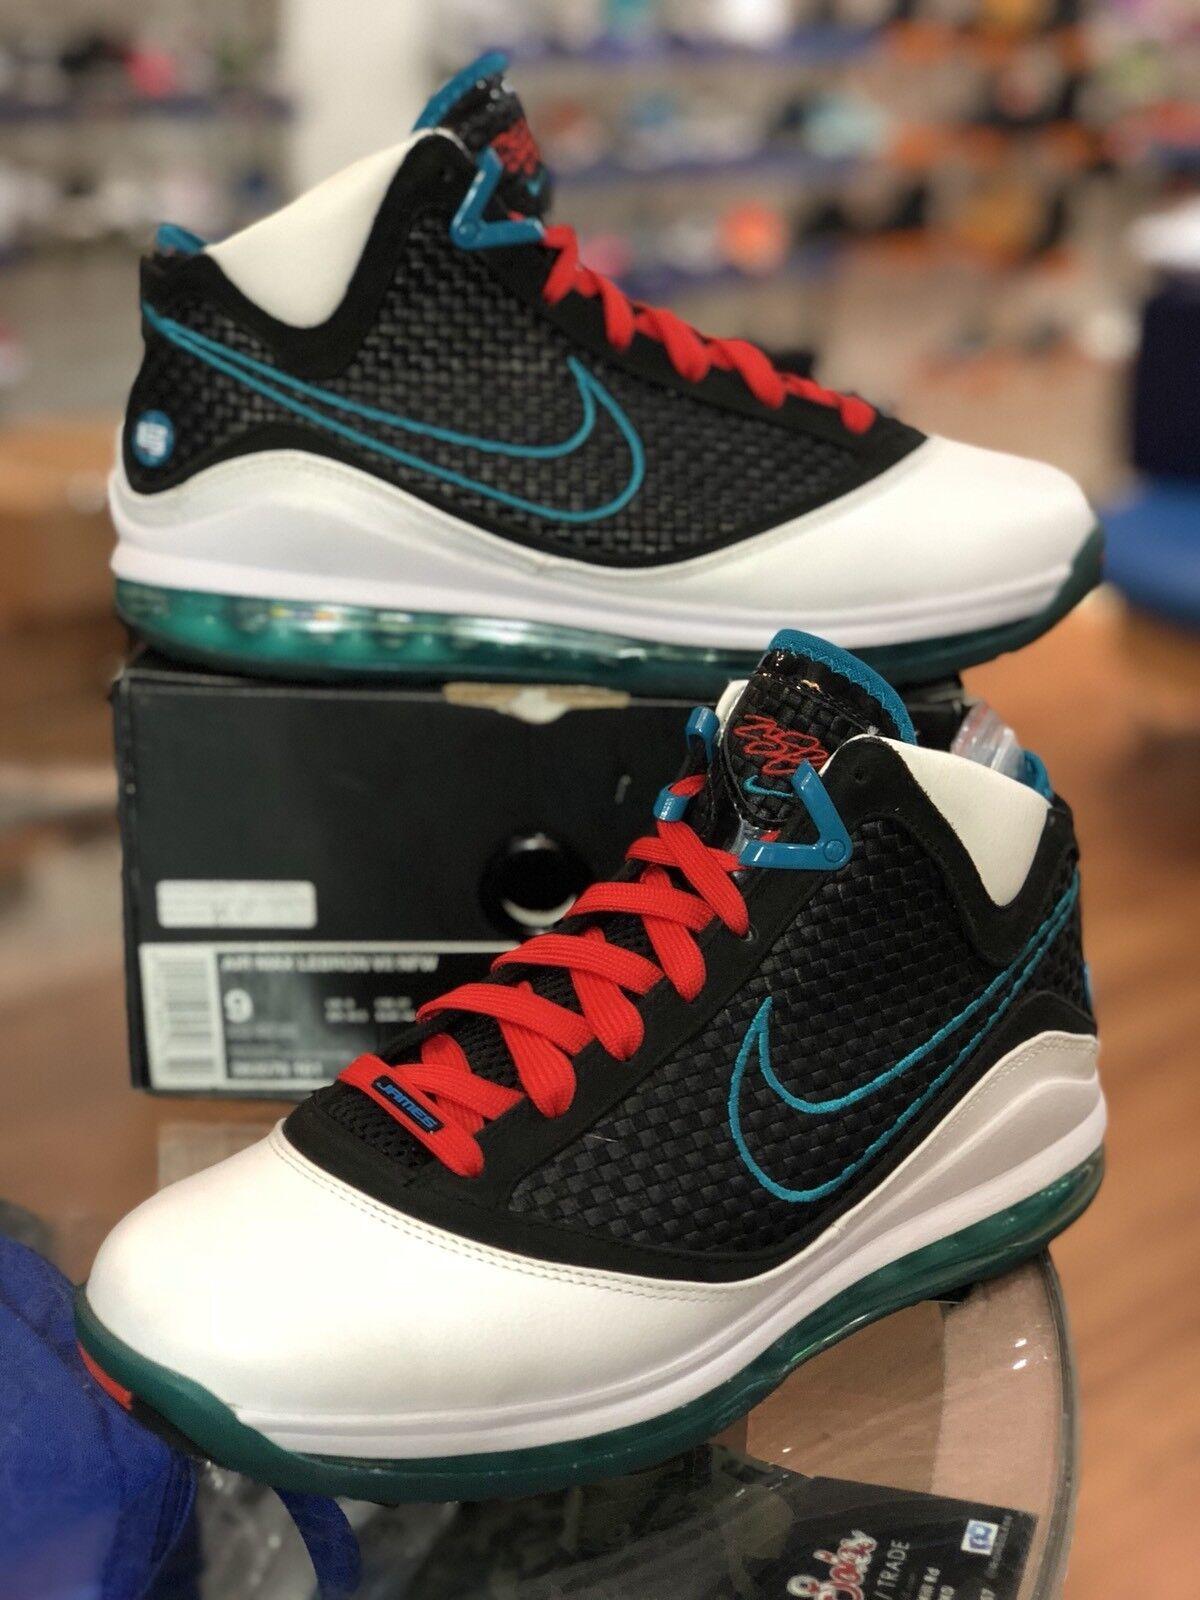 Nike Lebron 7 VII para nfw Alfombra Roja 383578 101 para VII hombre 0a8a0d